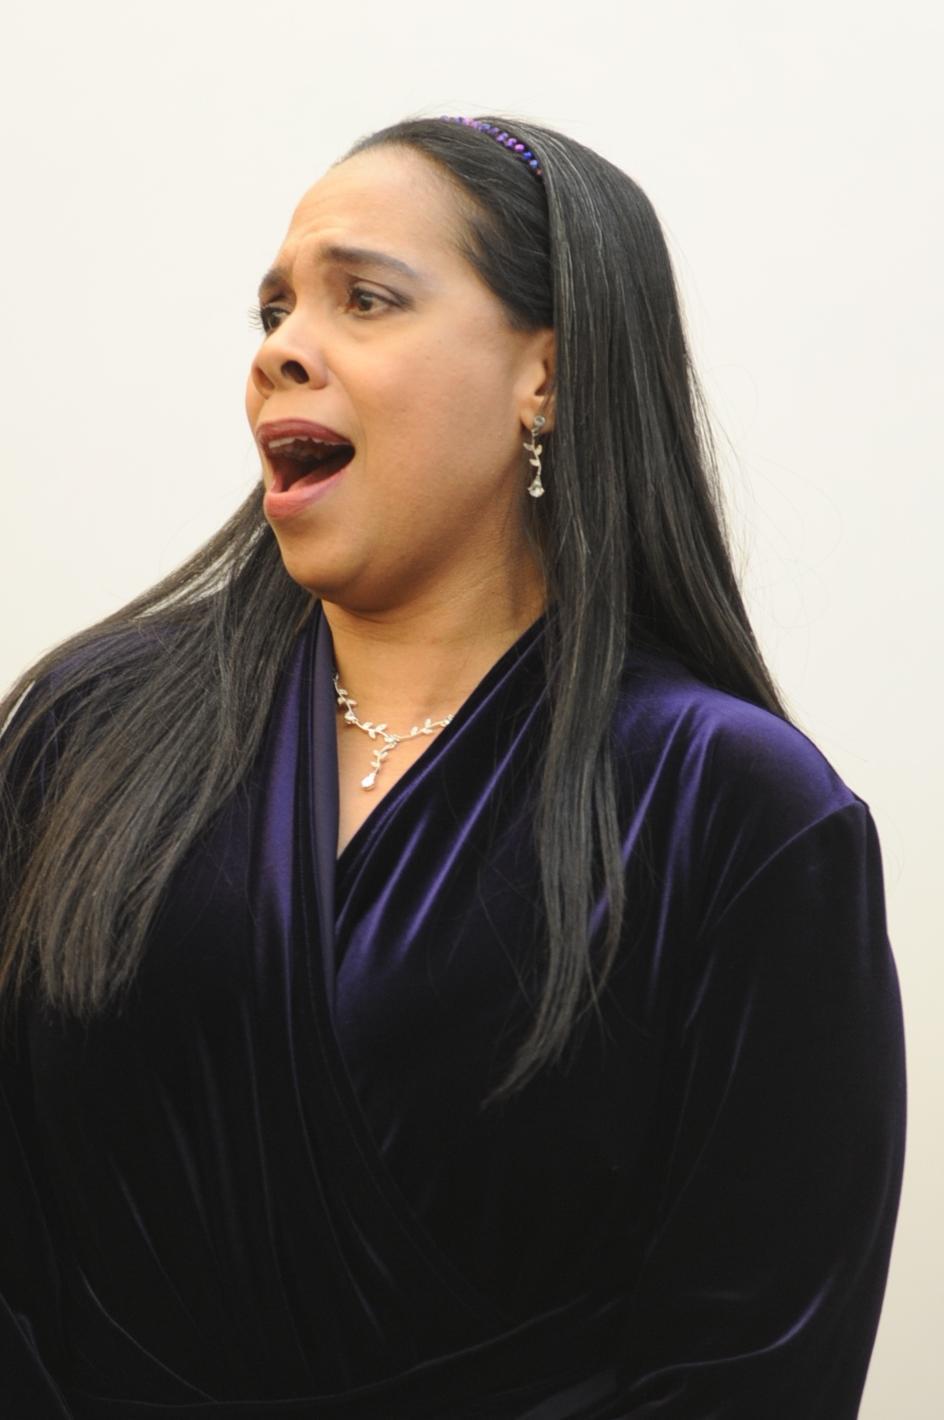 Iris Fairfax performs at the Elkins Park Library. Staff photo/Scott Roman